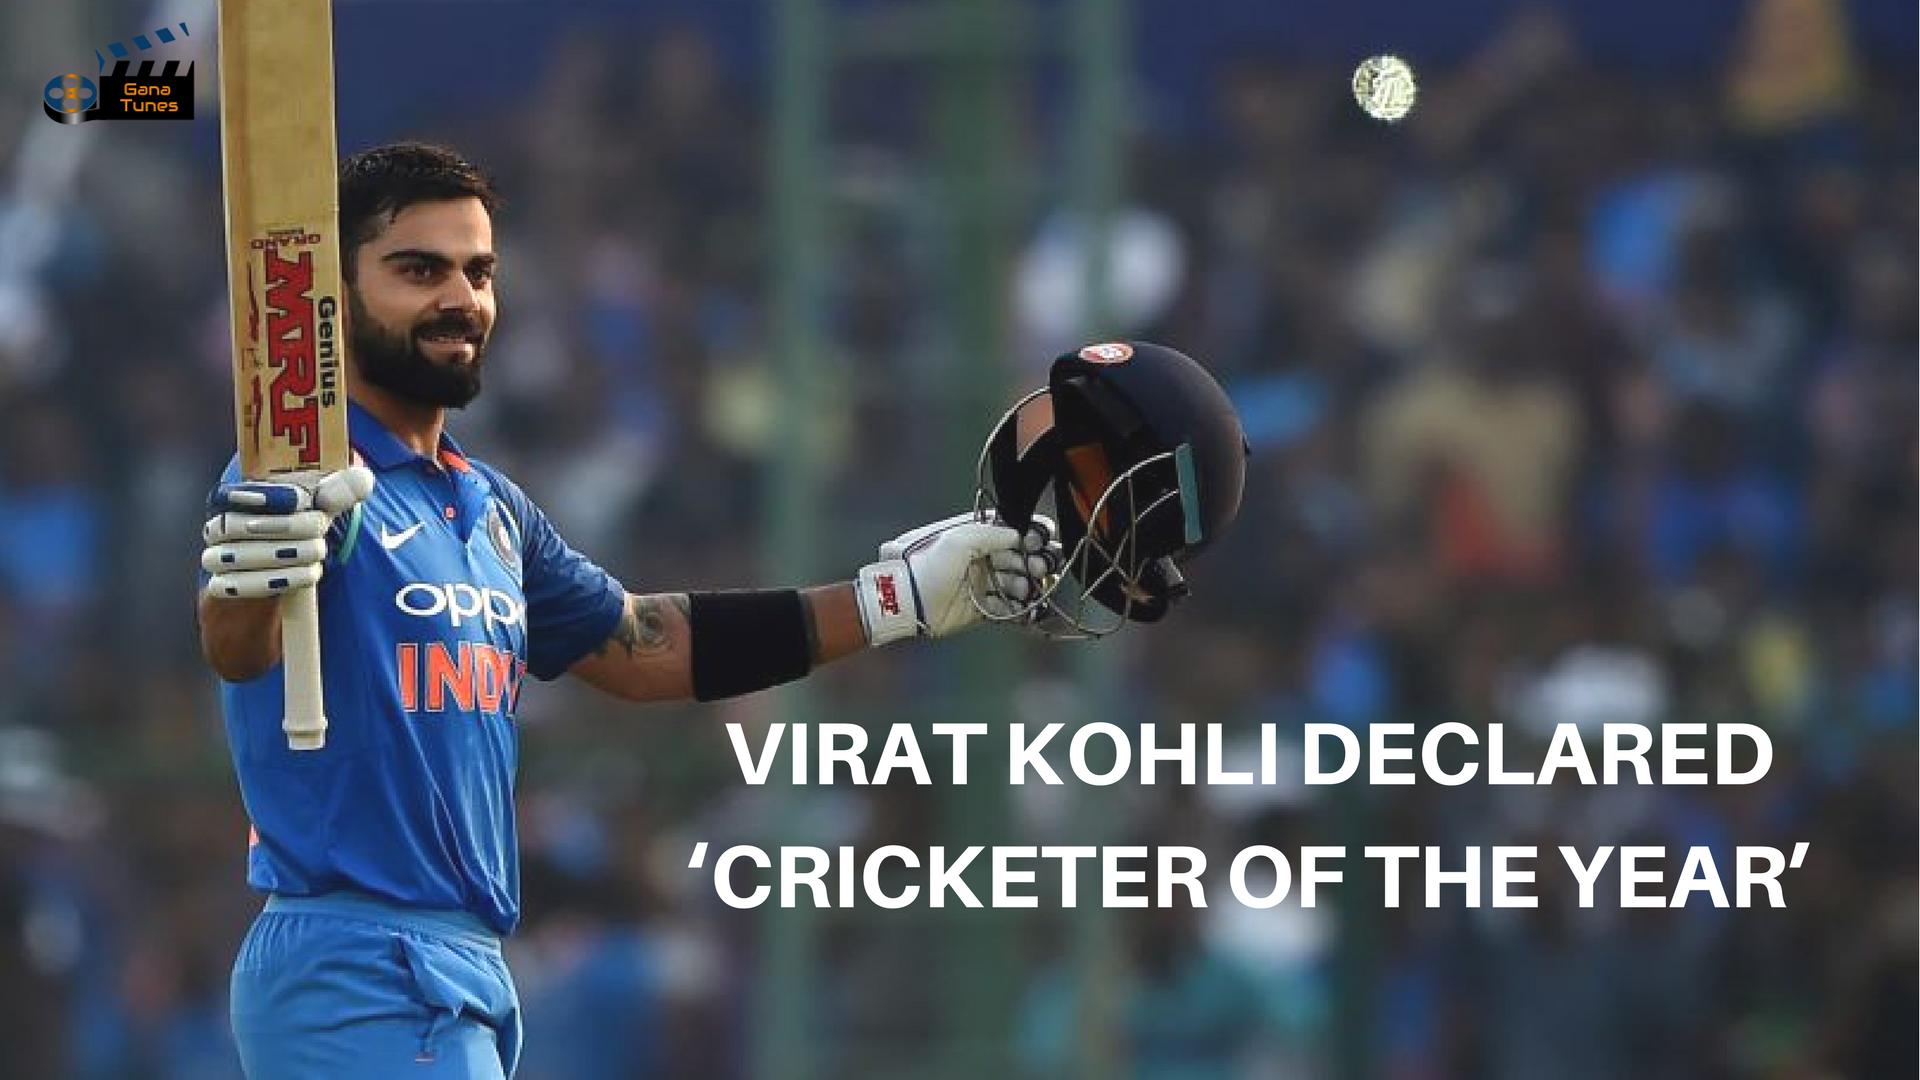 Cricketer of the year Virat Kohli